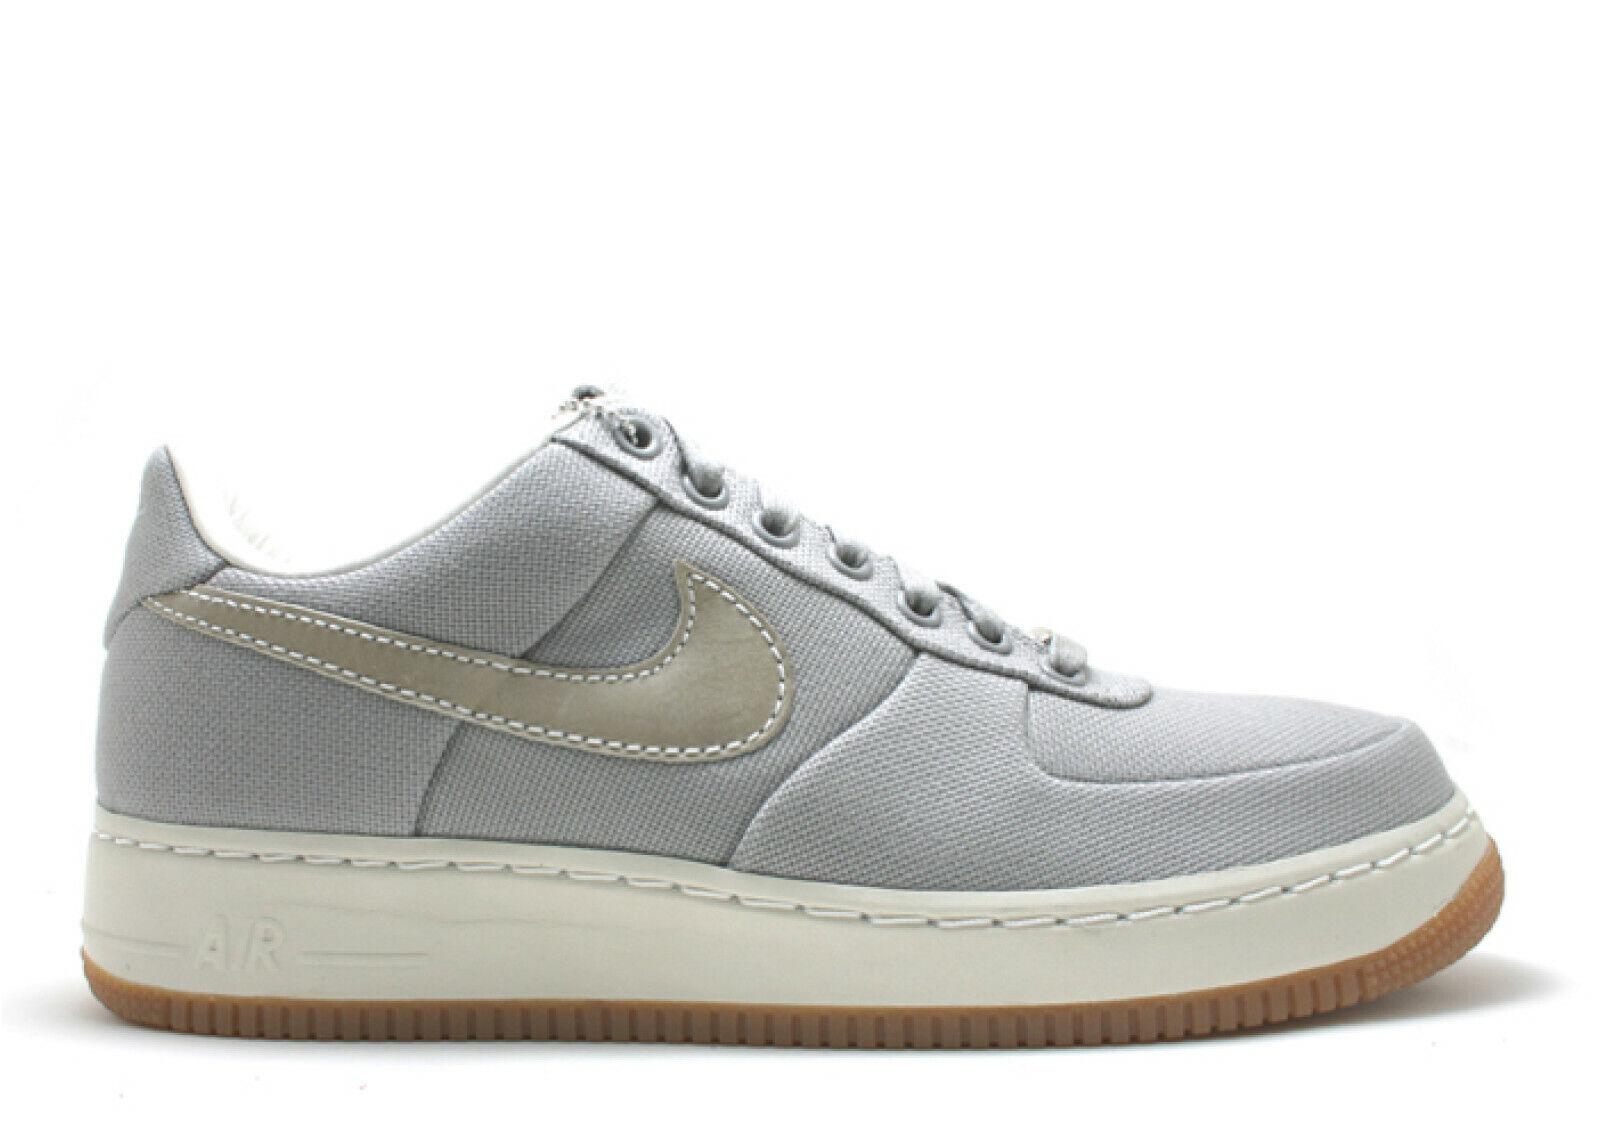 2007 Nike Air Force 1 Supreme'07 TAILLE 12 gris moyen toile blanc cassé 316133-011